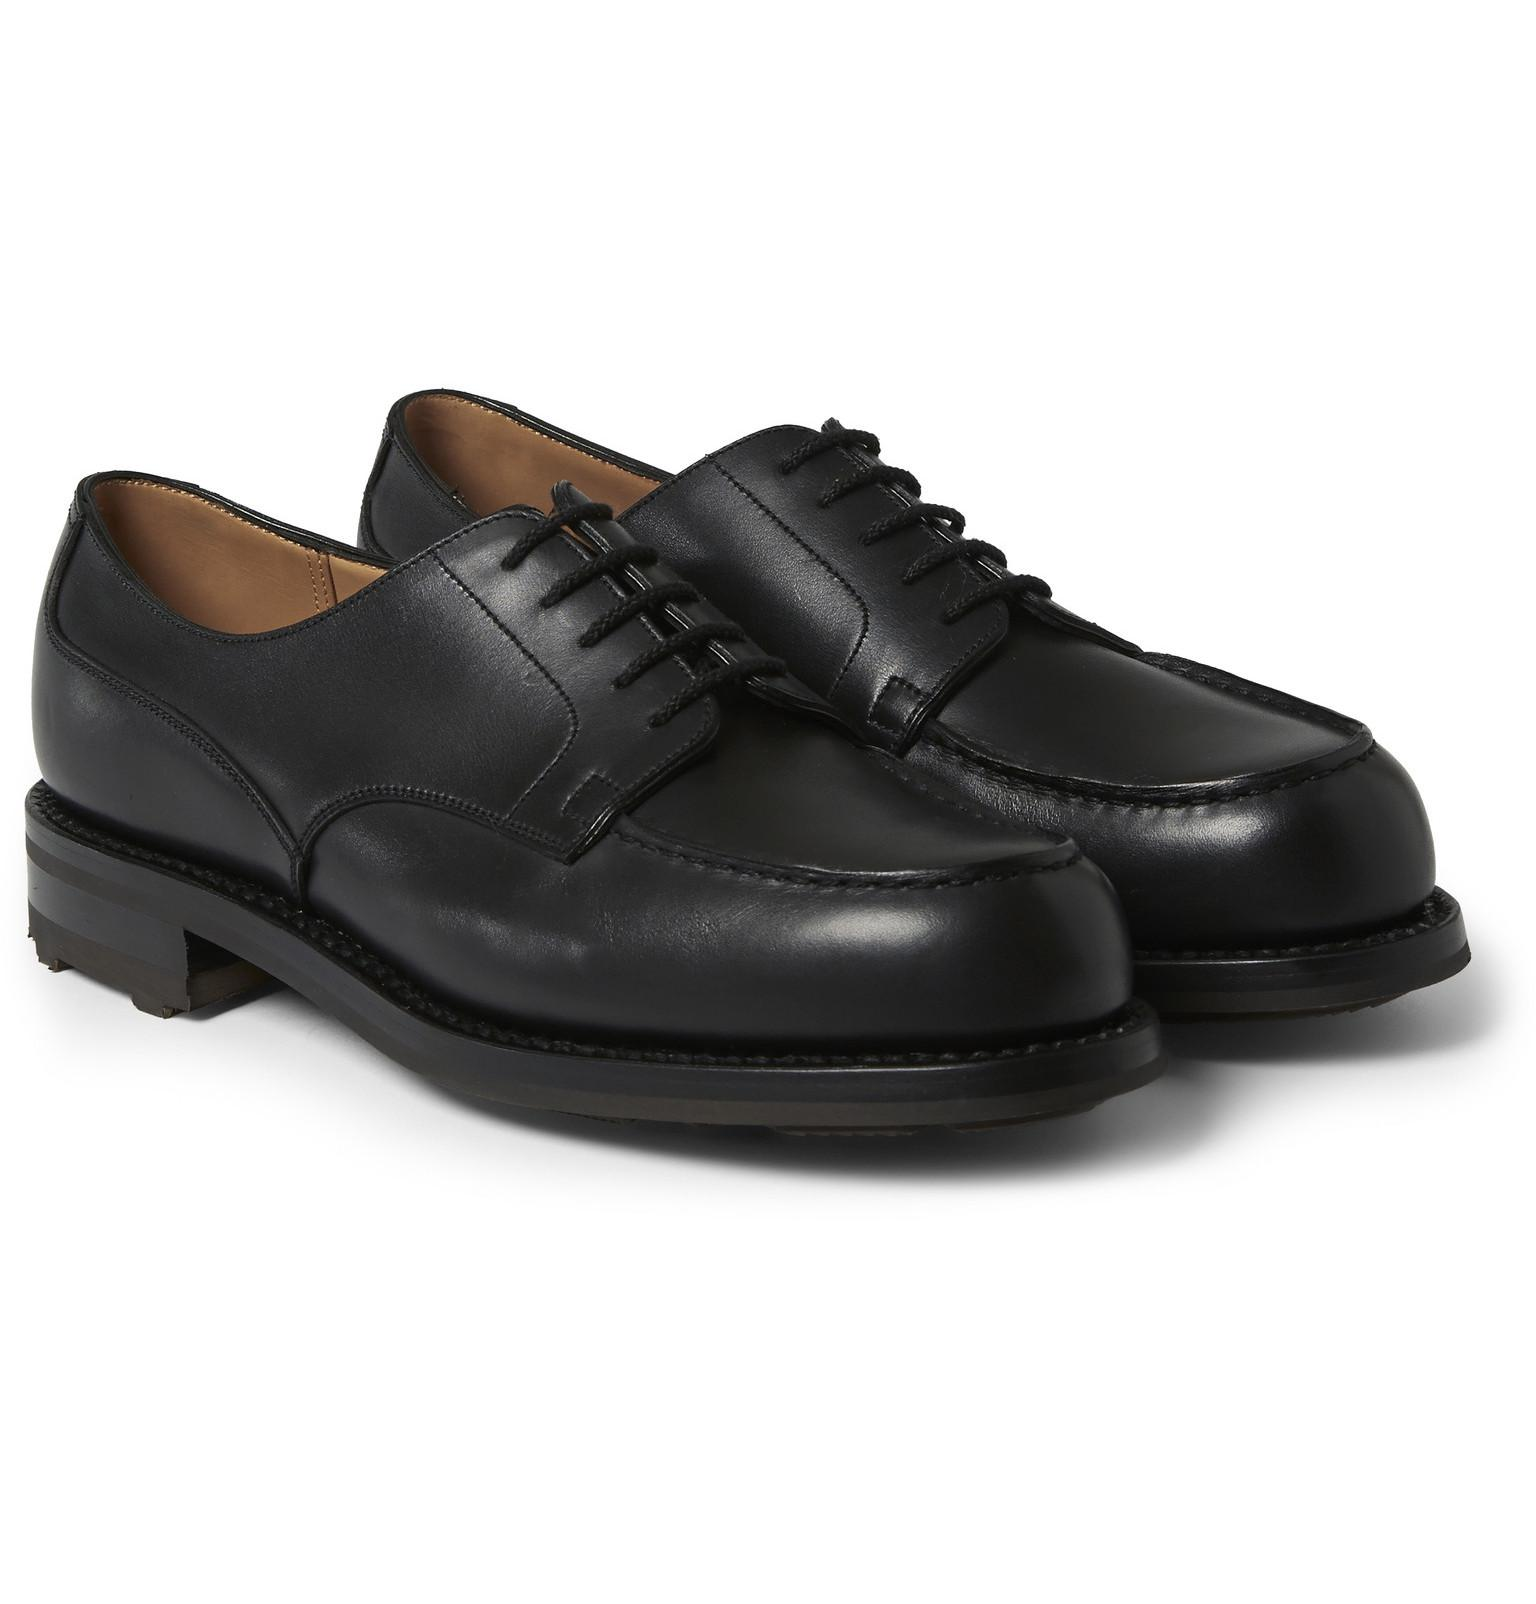 Chaussures Derby En Daim Kiltie Garnis De Cuir Jm Weston Magasin De Destockage Pour 0vKUbQuyXN